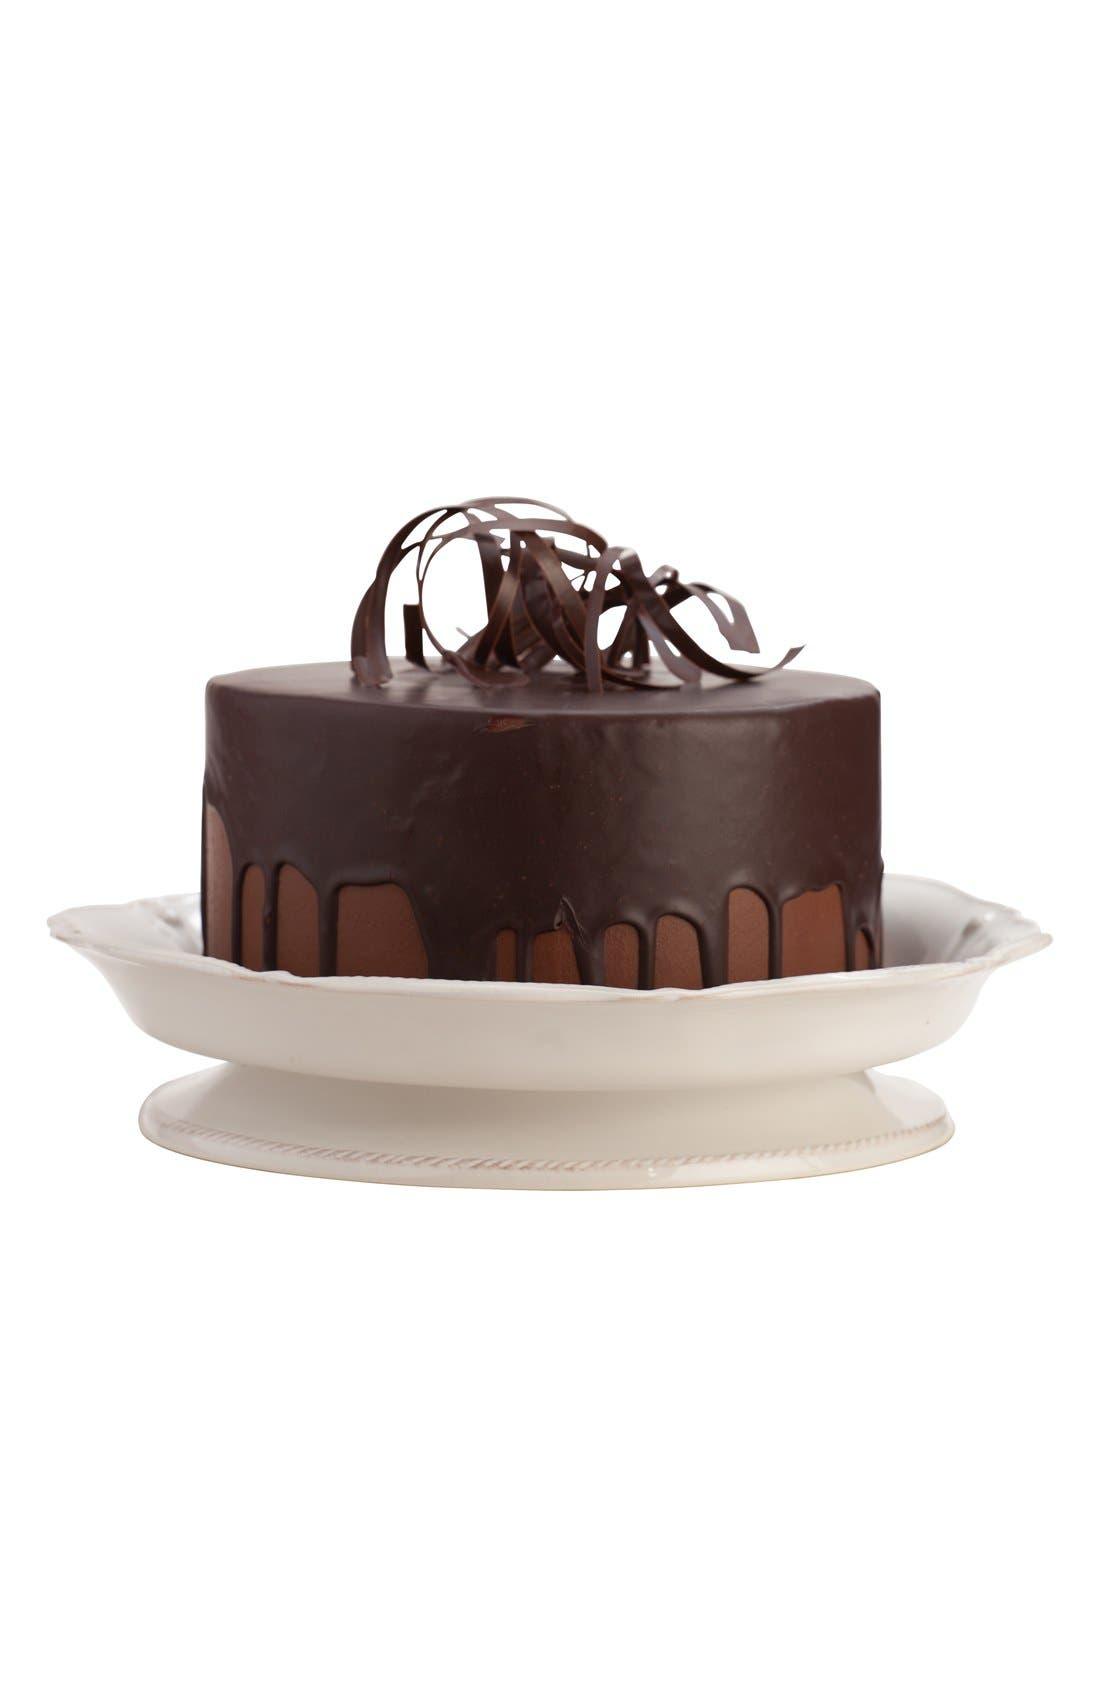 Alternate Image 2  - Juliska'Berry and Thread' Cake Stand Serving Pedestal